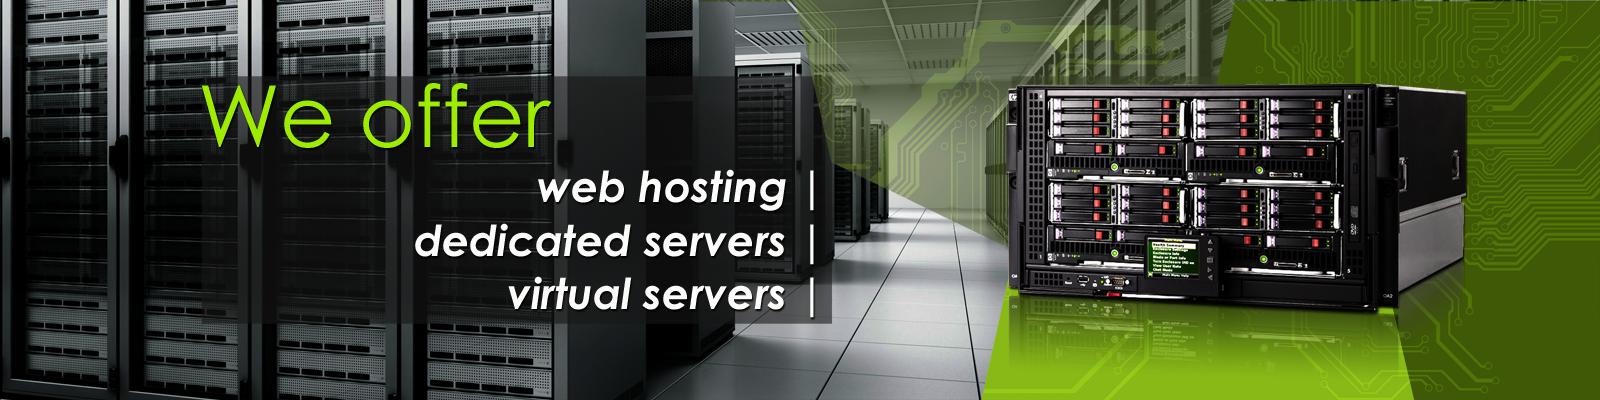 01-web-hosting